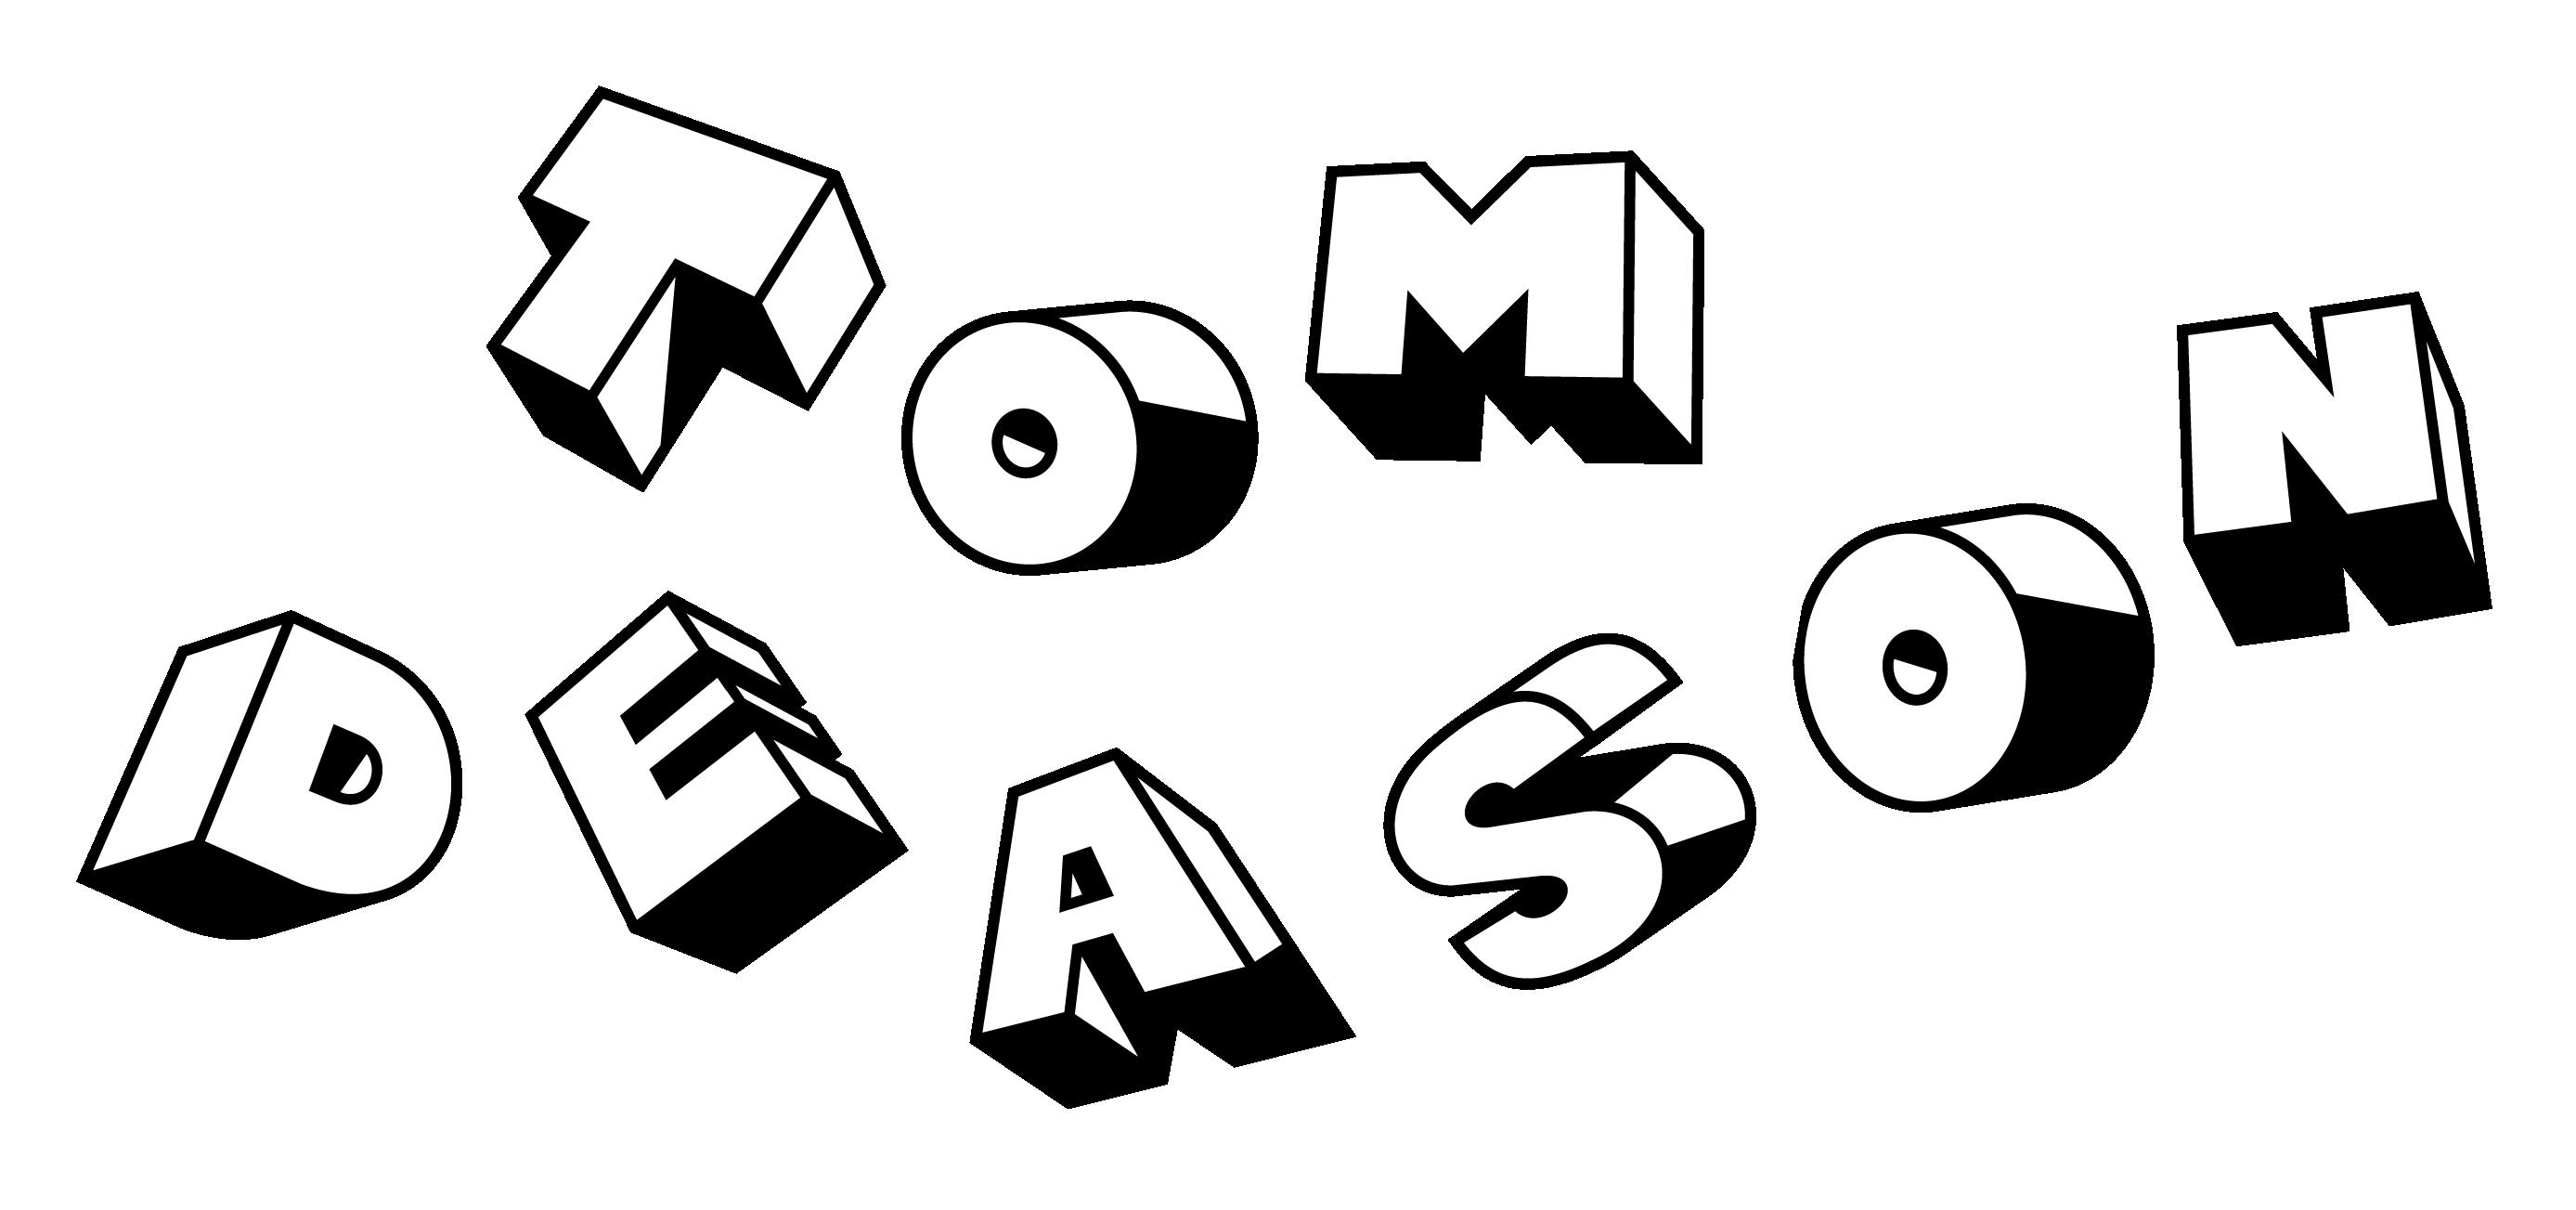 Tom Deason